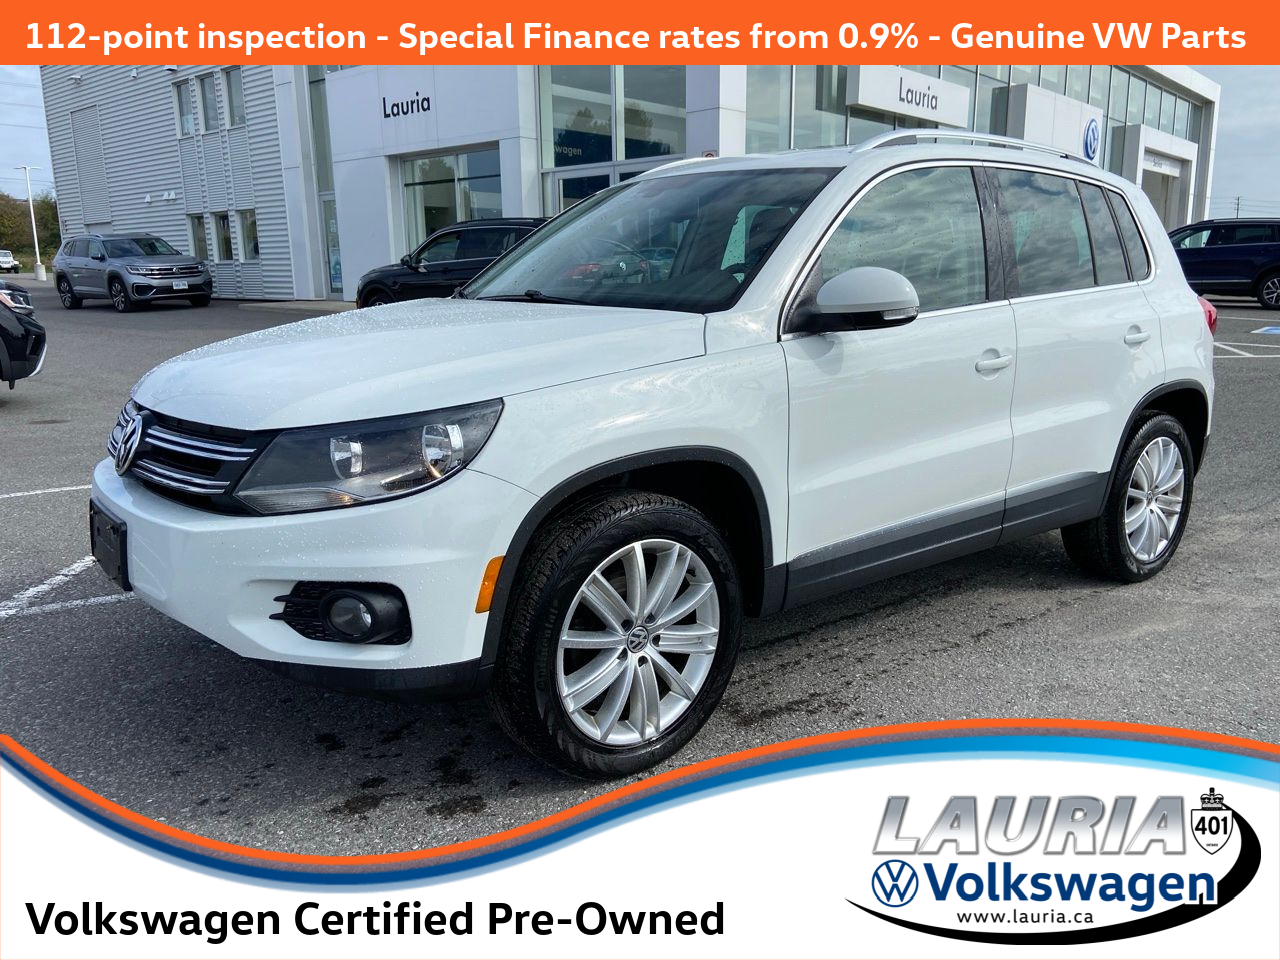 used 2017 Volkswagen Tiguan car, priced at $22,988